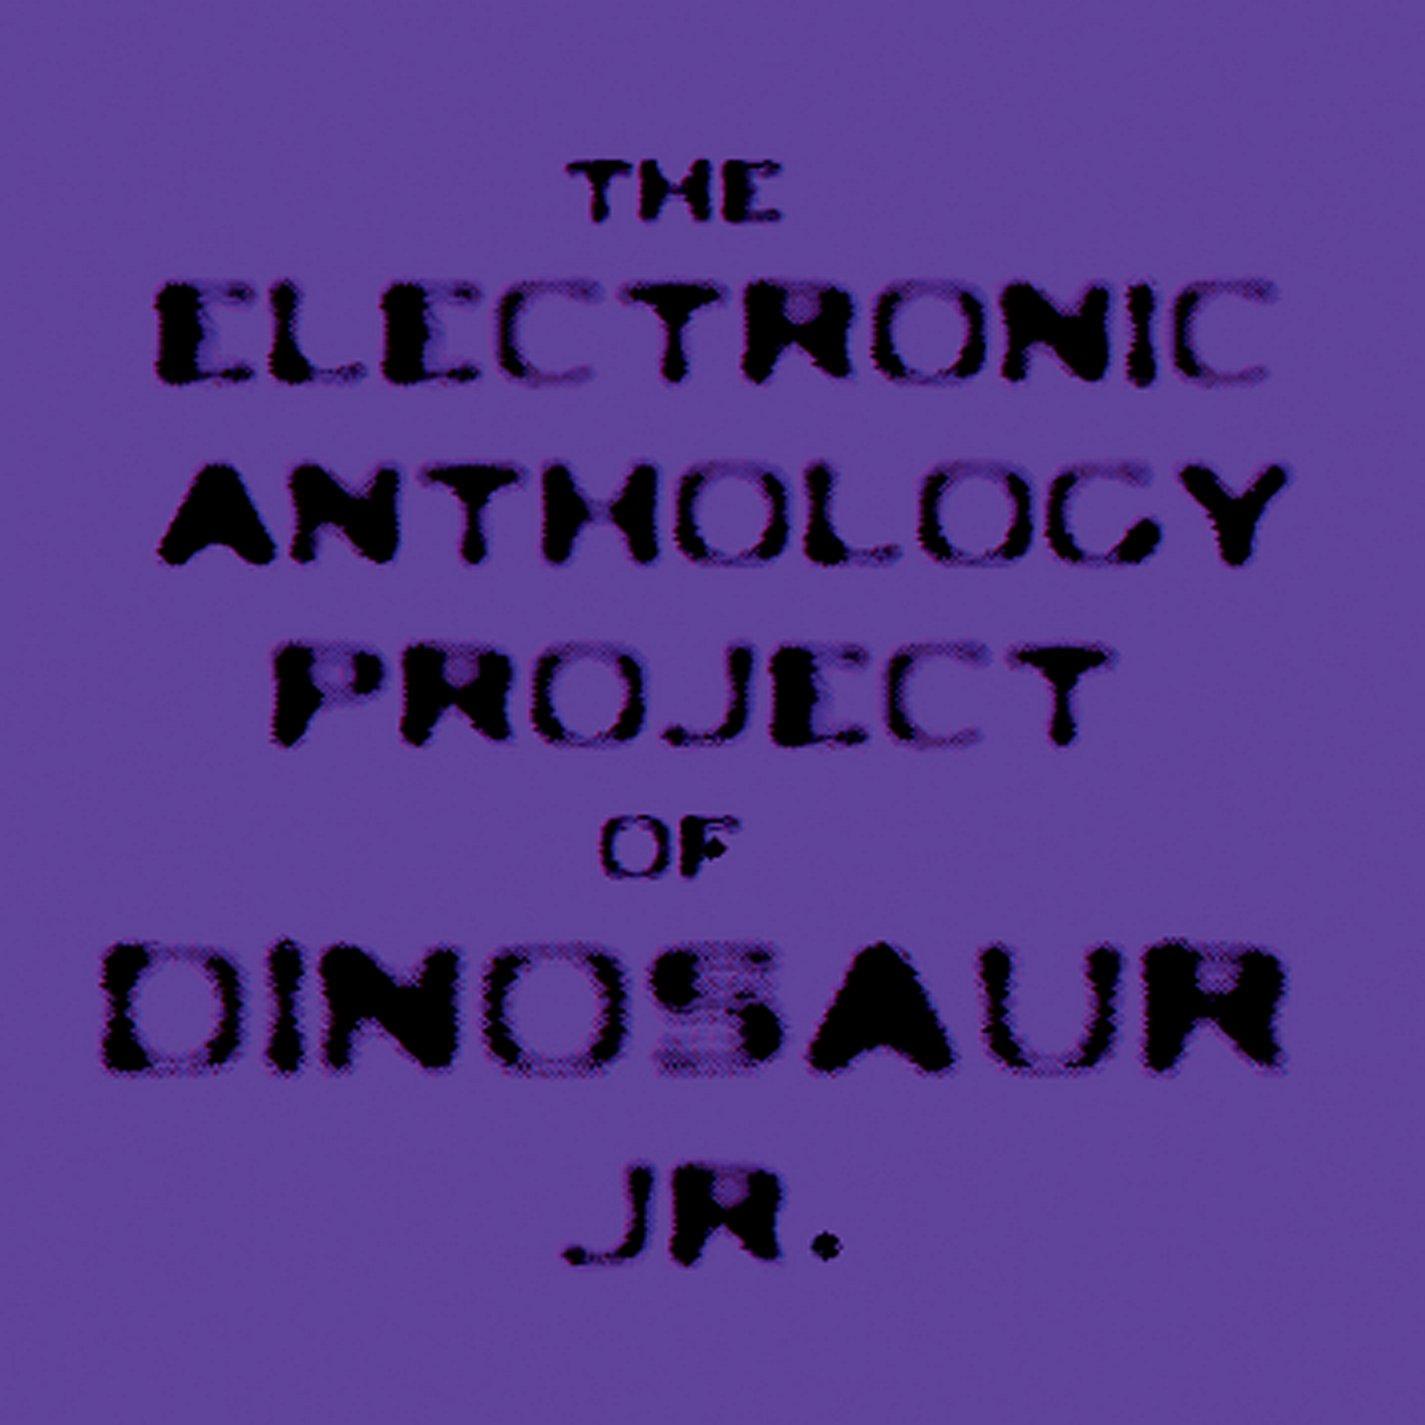 Electronic Anthology Project Dinosaur jr Project of Dinosaur jr